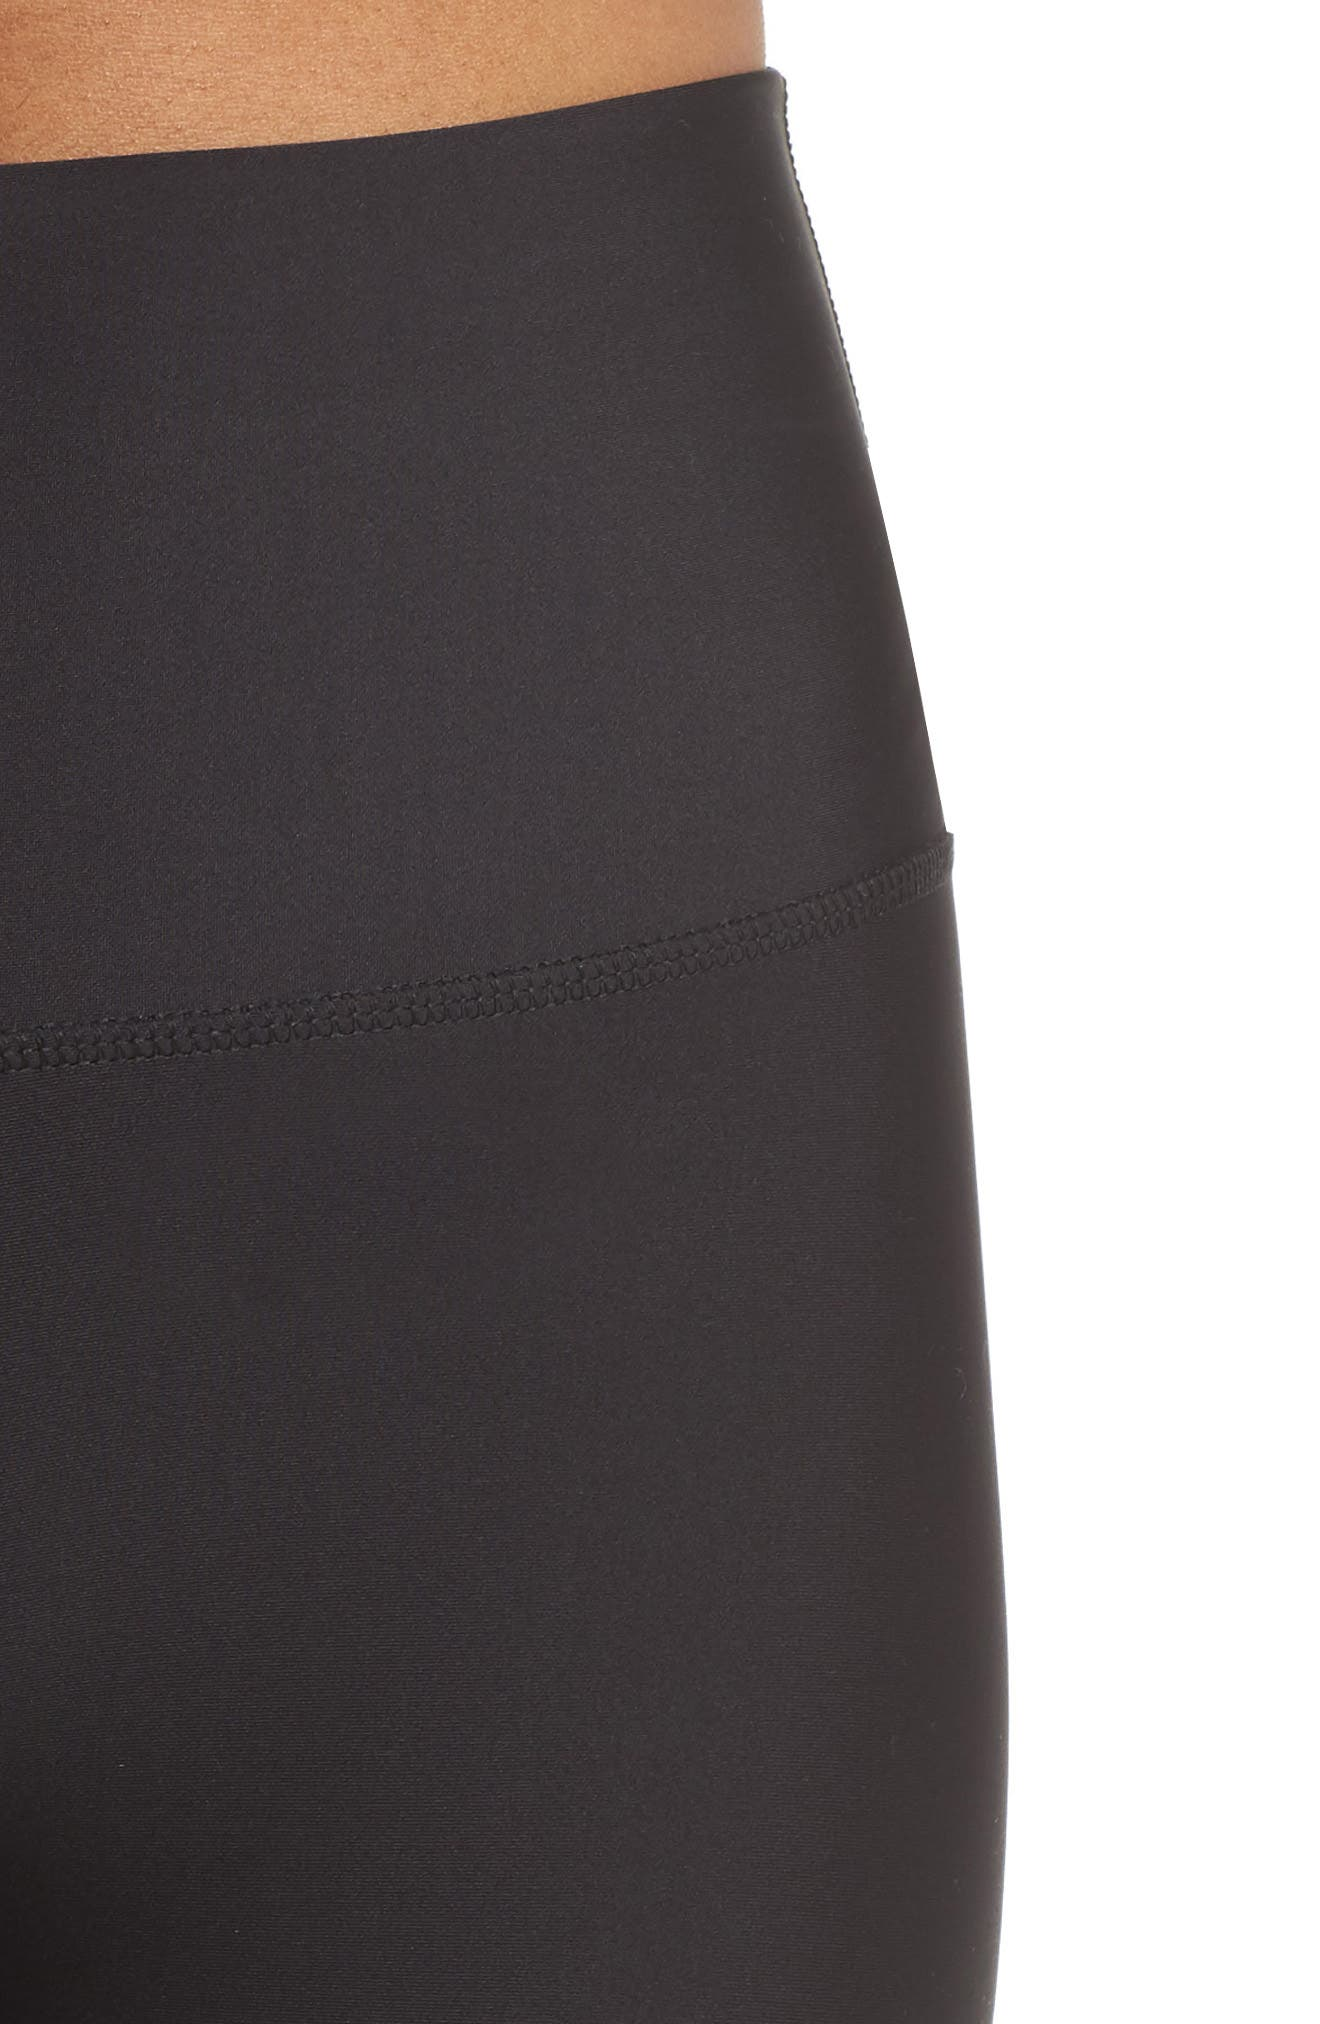 Airbrush Tech Lift High Waist Capris,                             Alternate thumbnail 4, color,                             BLACK